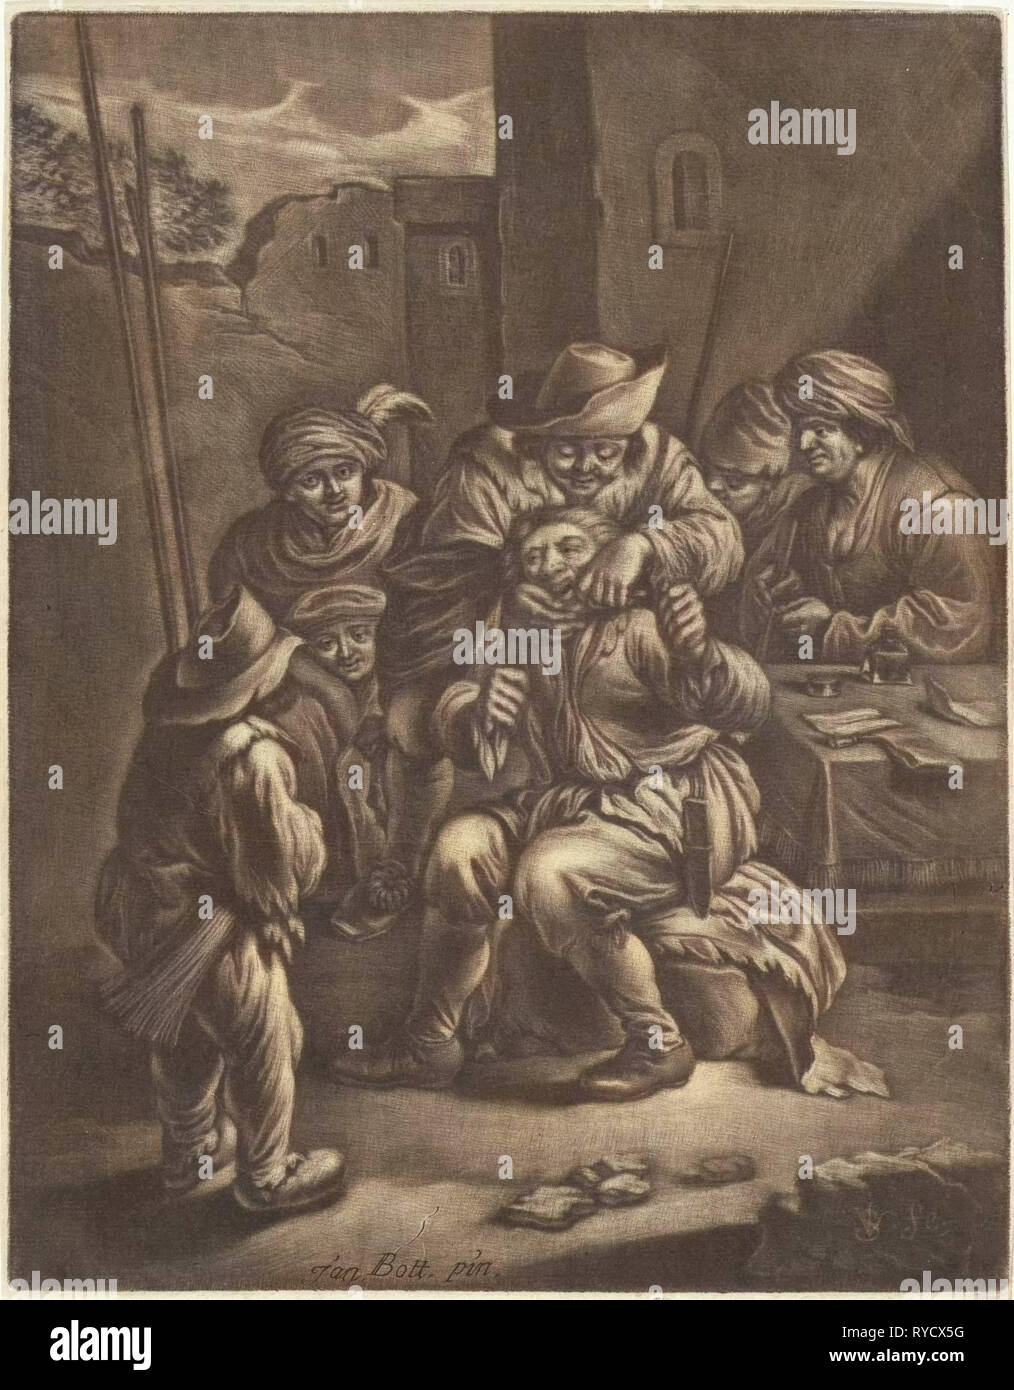 Dentist, print maker: Jan van Somer, Jan Both, 1655 - 1700 - Stock Image